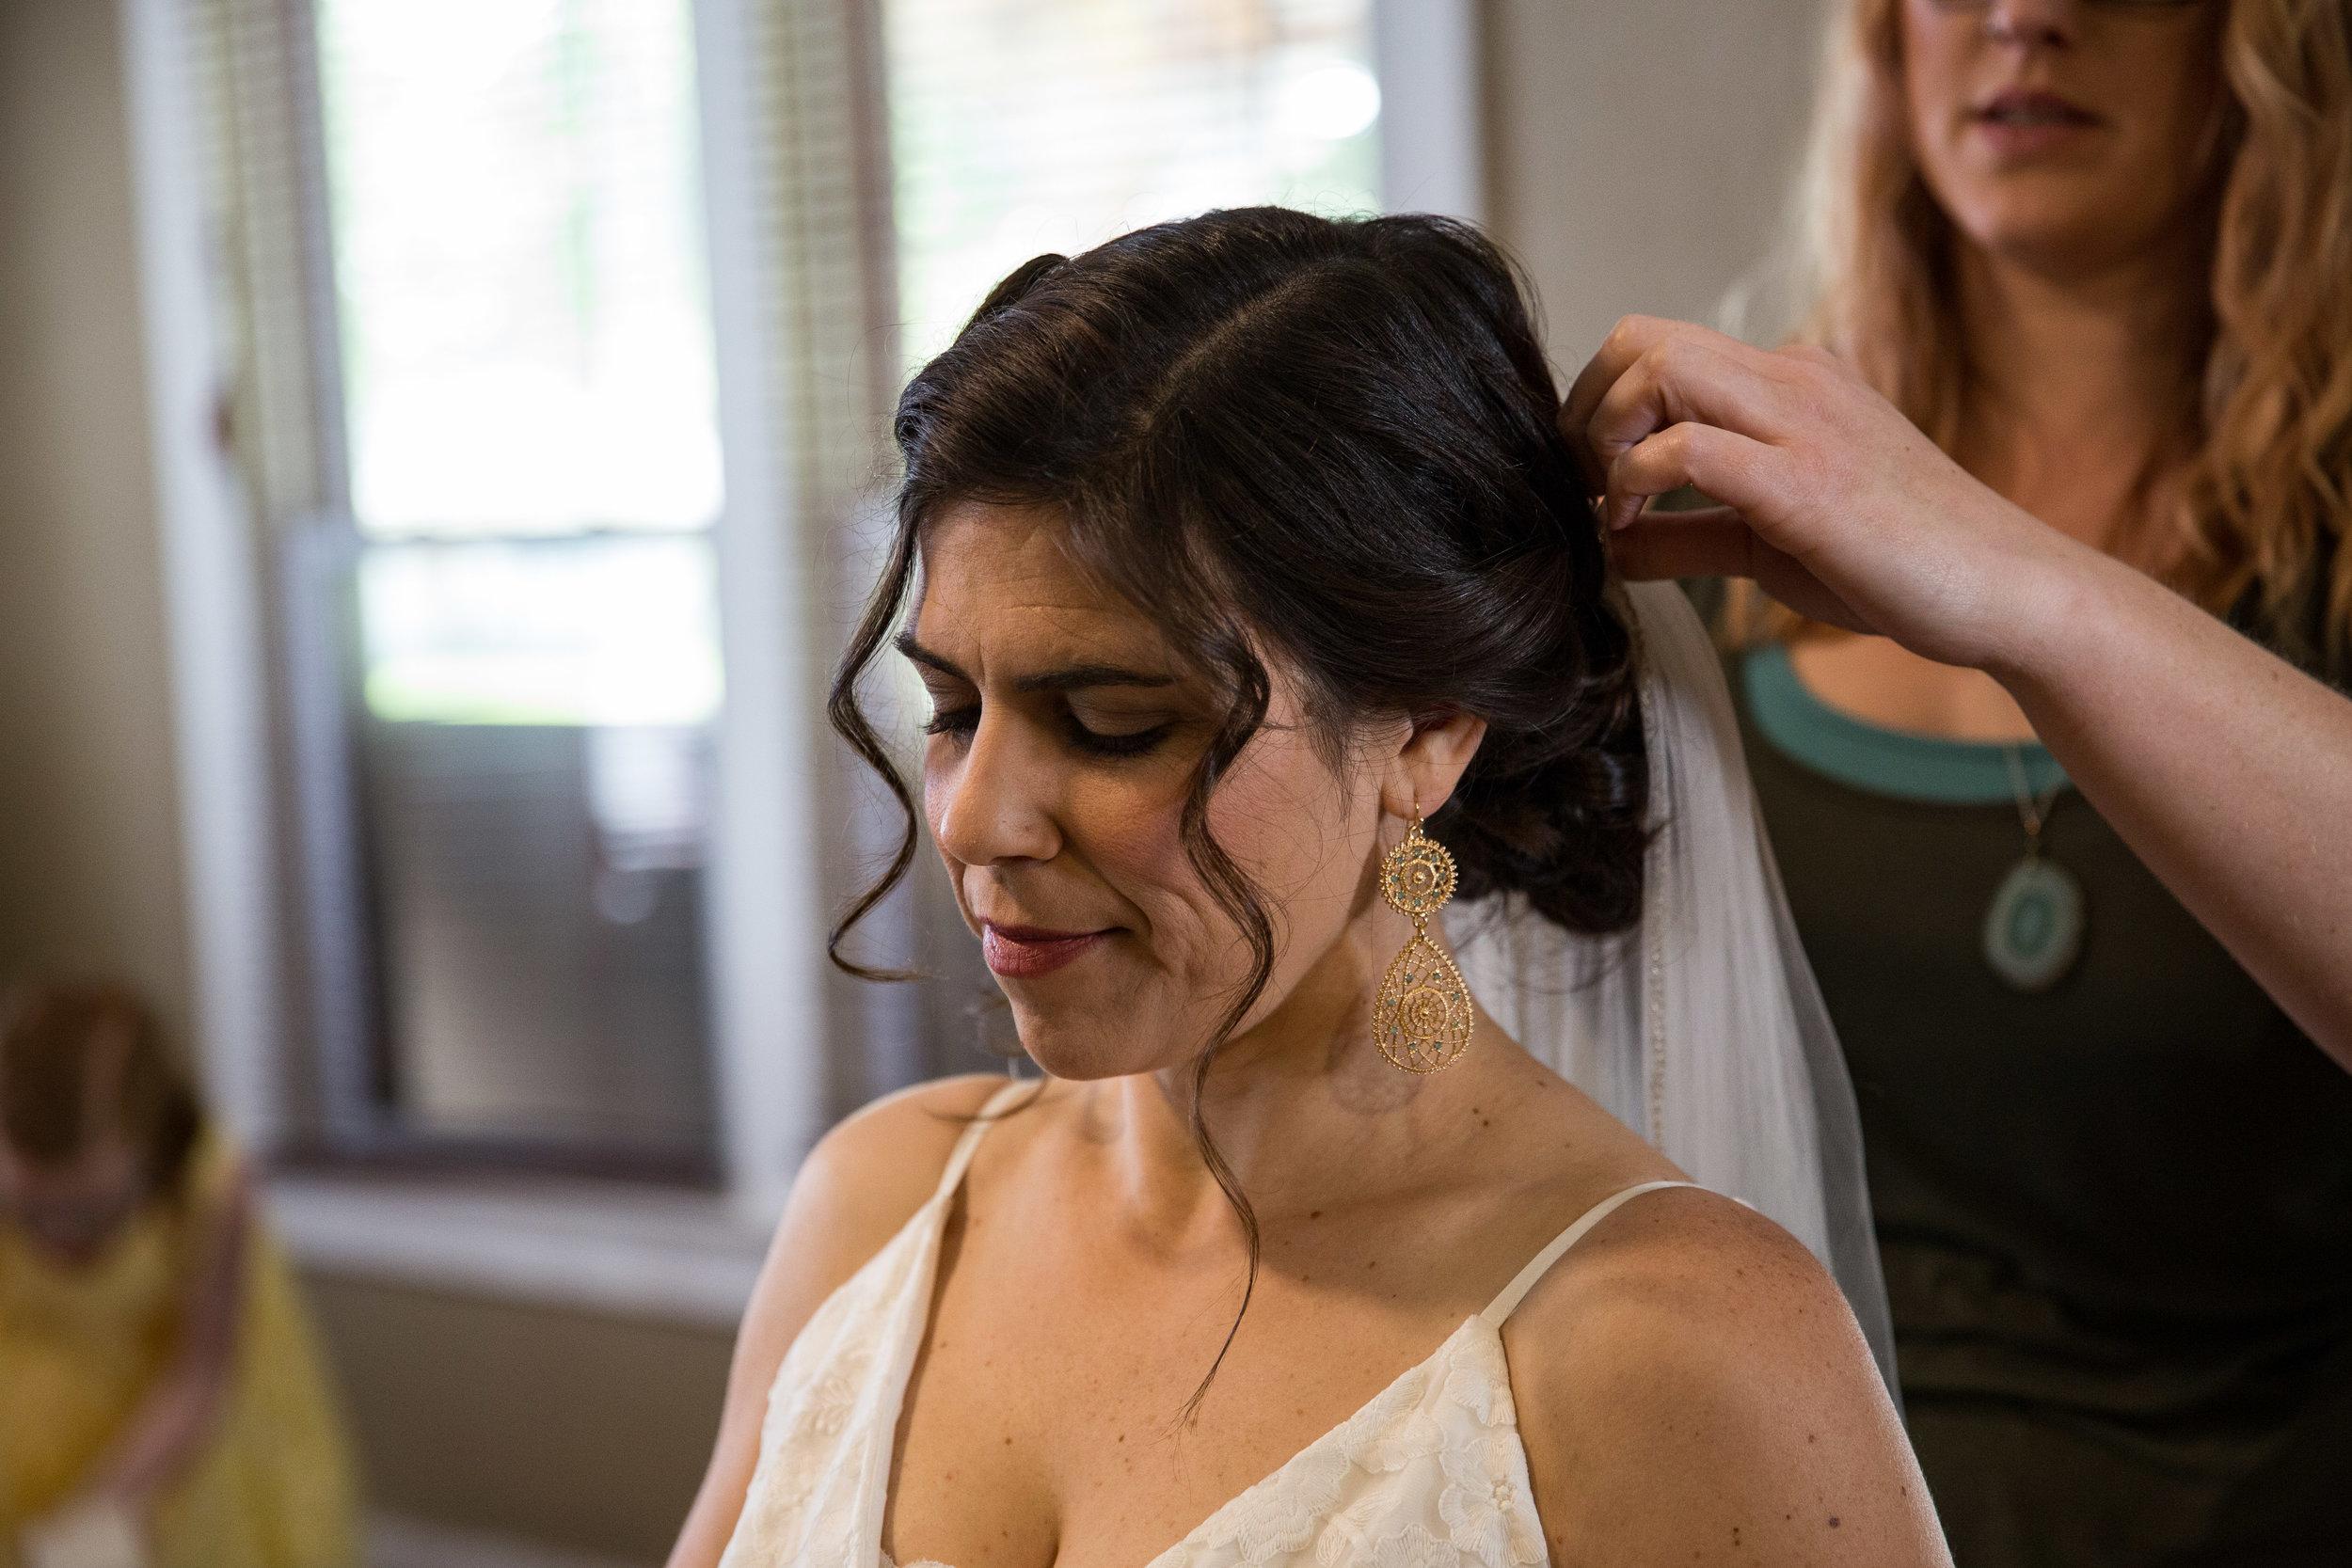 Natalie and Dallas Mooney Wedding 6-8-19_Tania Watt Photography-3.jpg